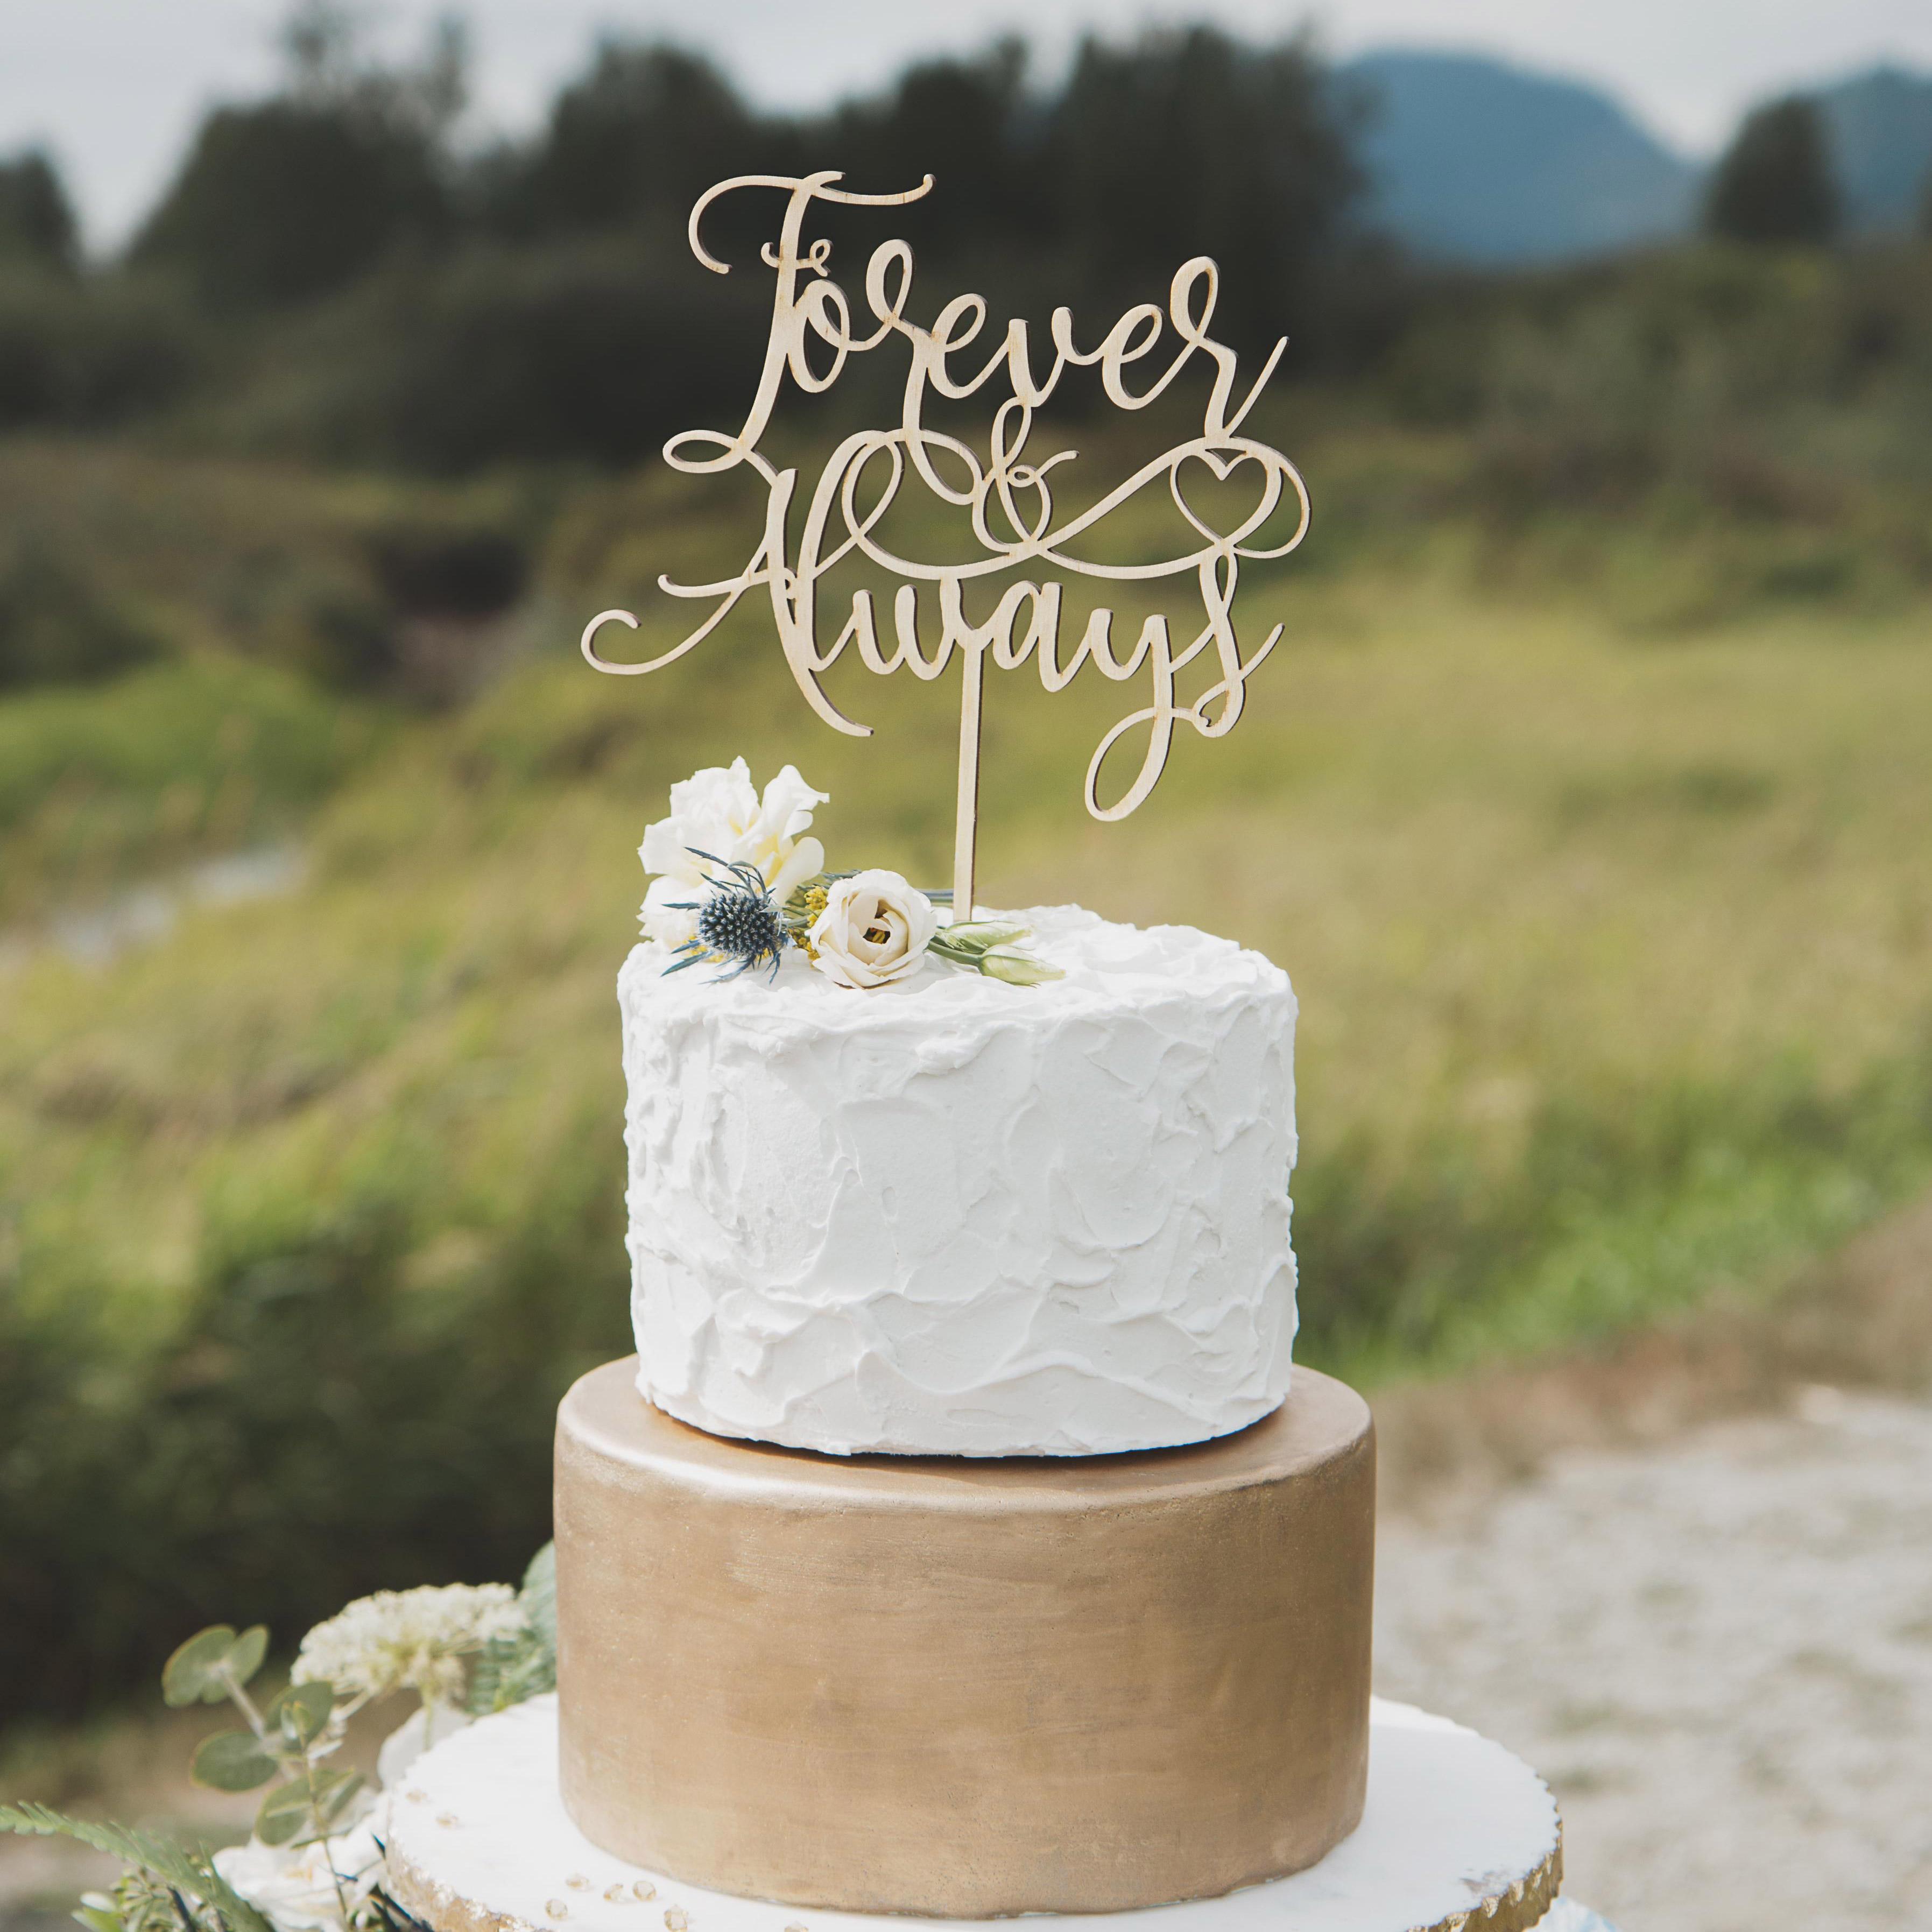 Wedding Cake Topper.Forever And Always Cake Topper